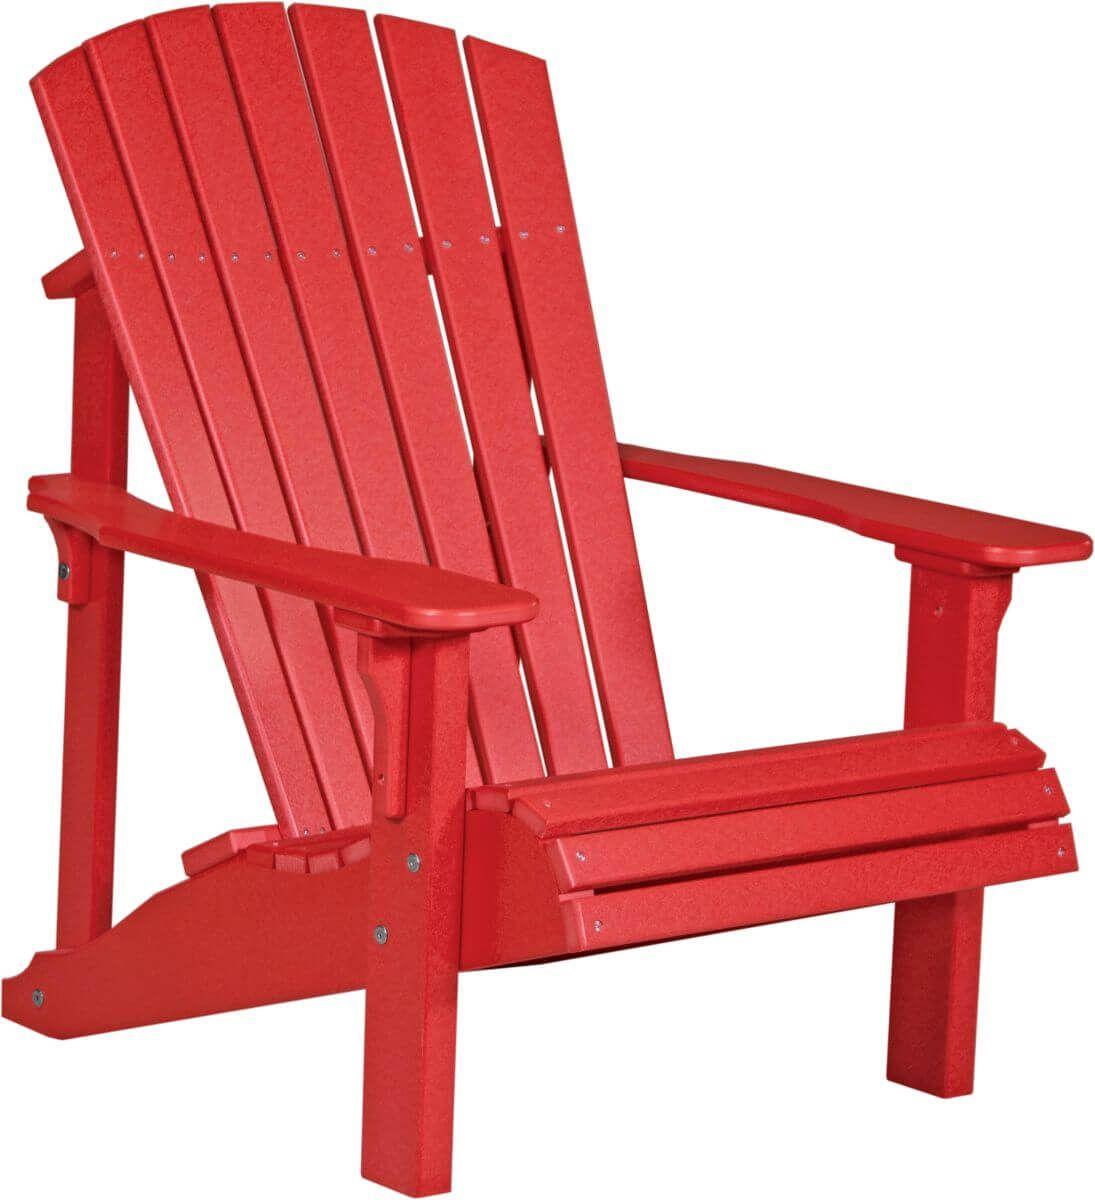 Red Rockaway Adirondack Chair